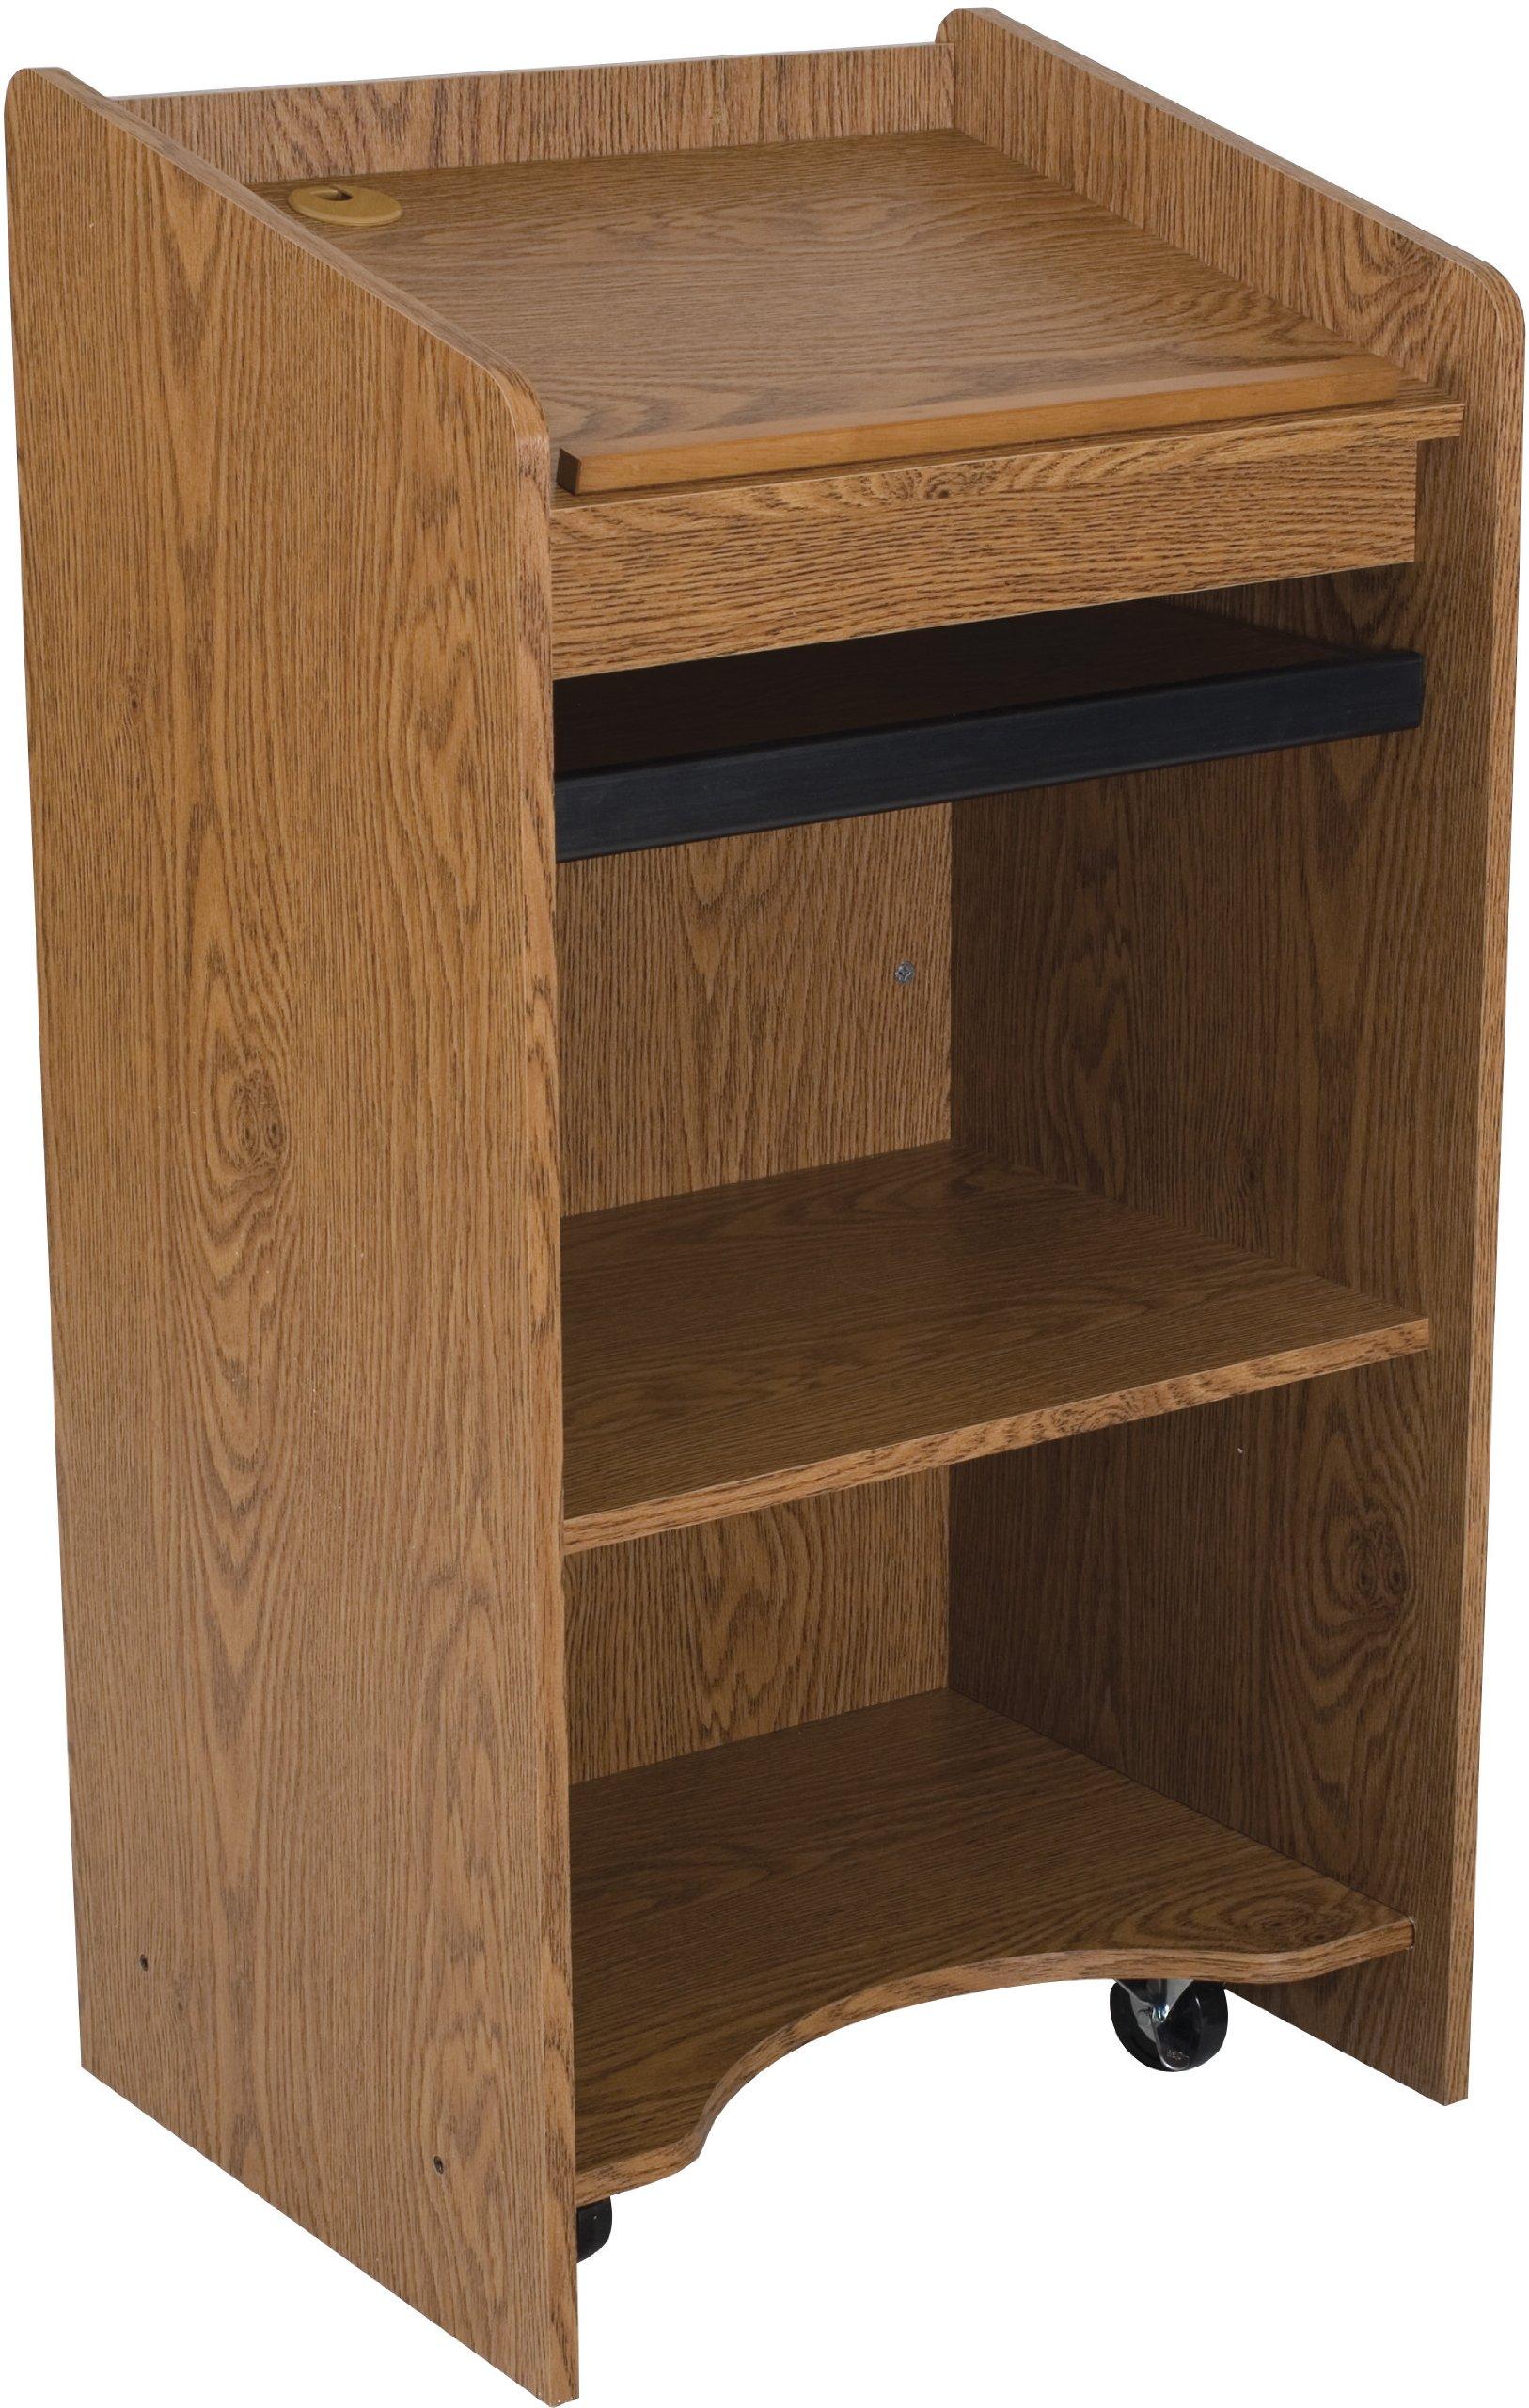 Balt 27510 Mobile Floor Lectern, Oak, 46''H x 25''W x 20.13''D